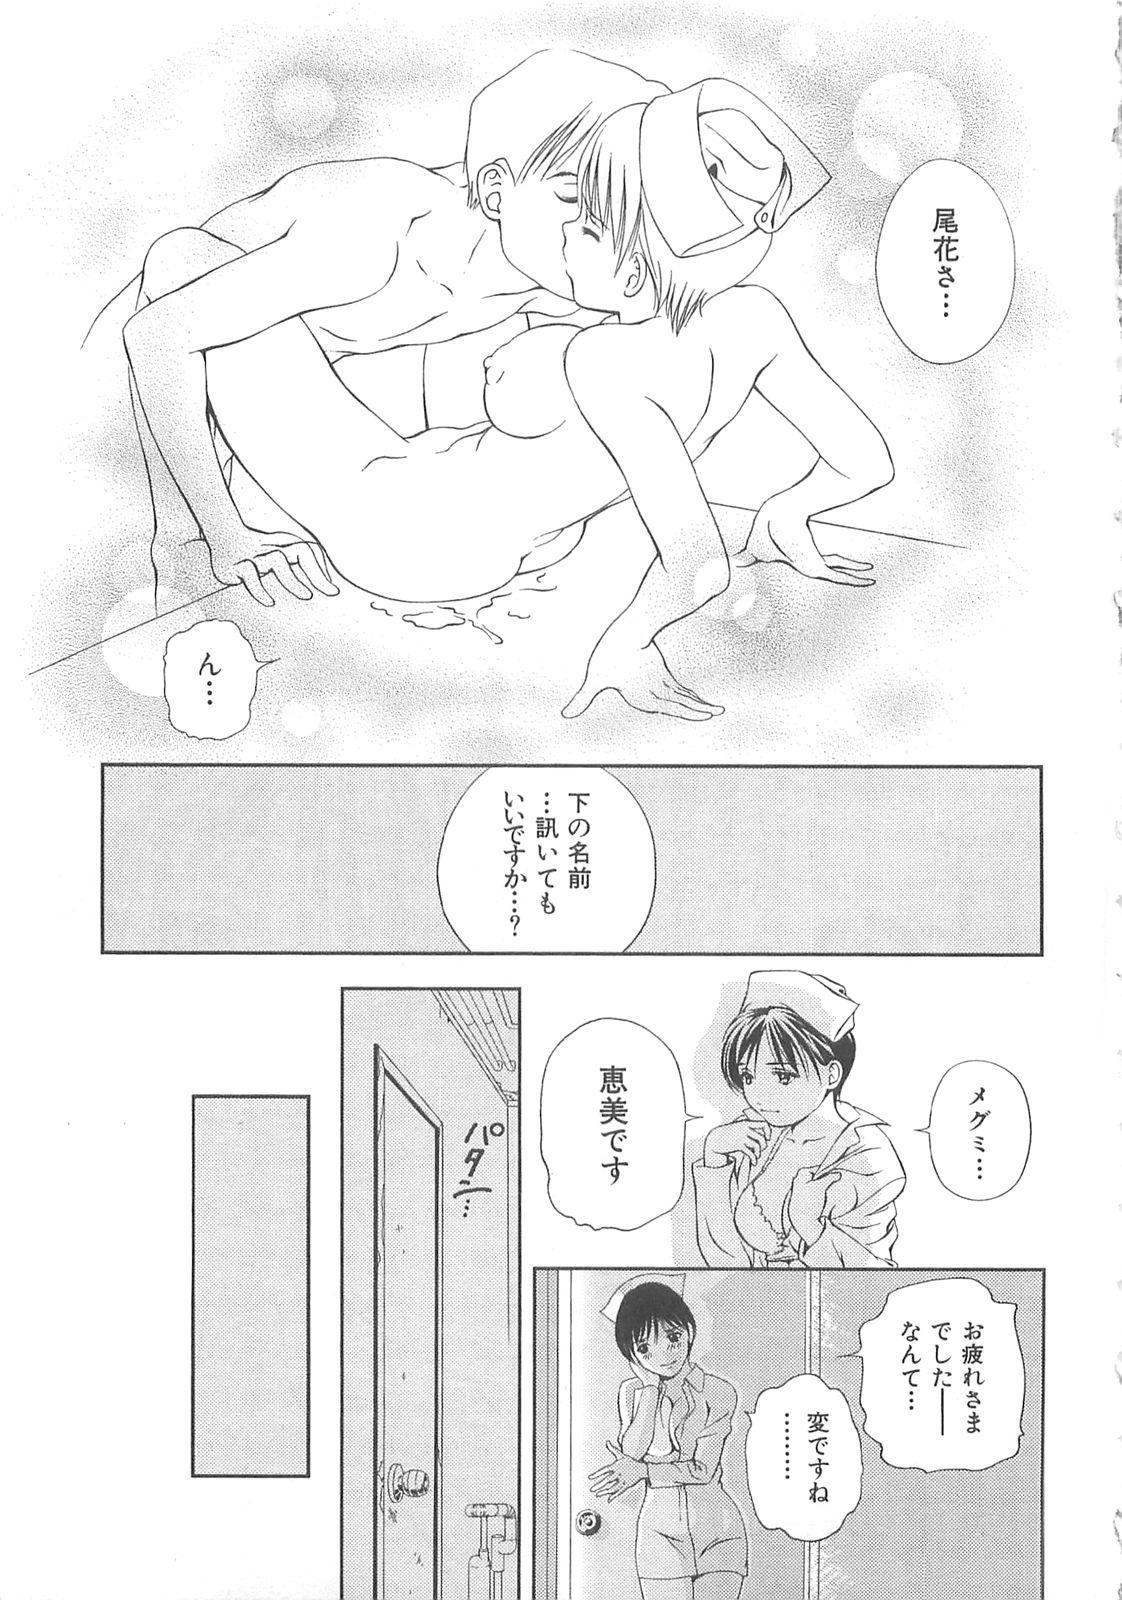 Tenshi no Kyuu - Angel's Pretty Hip 103